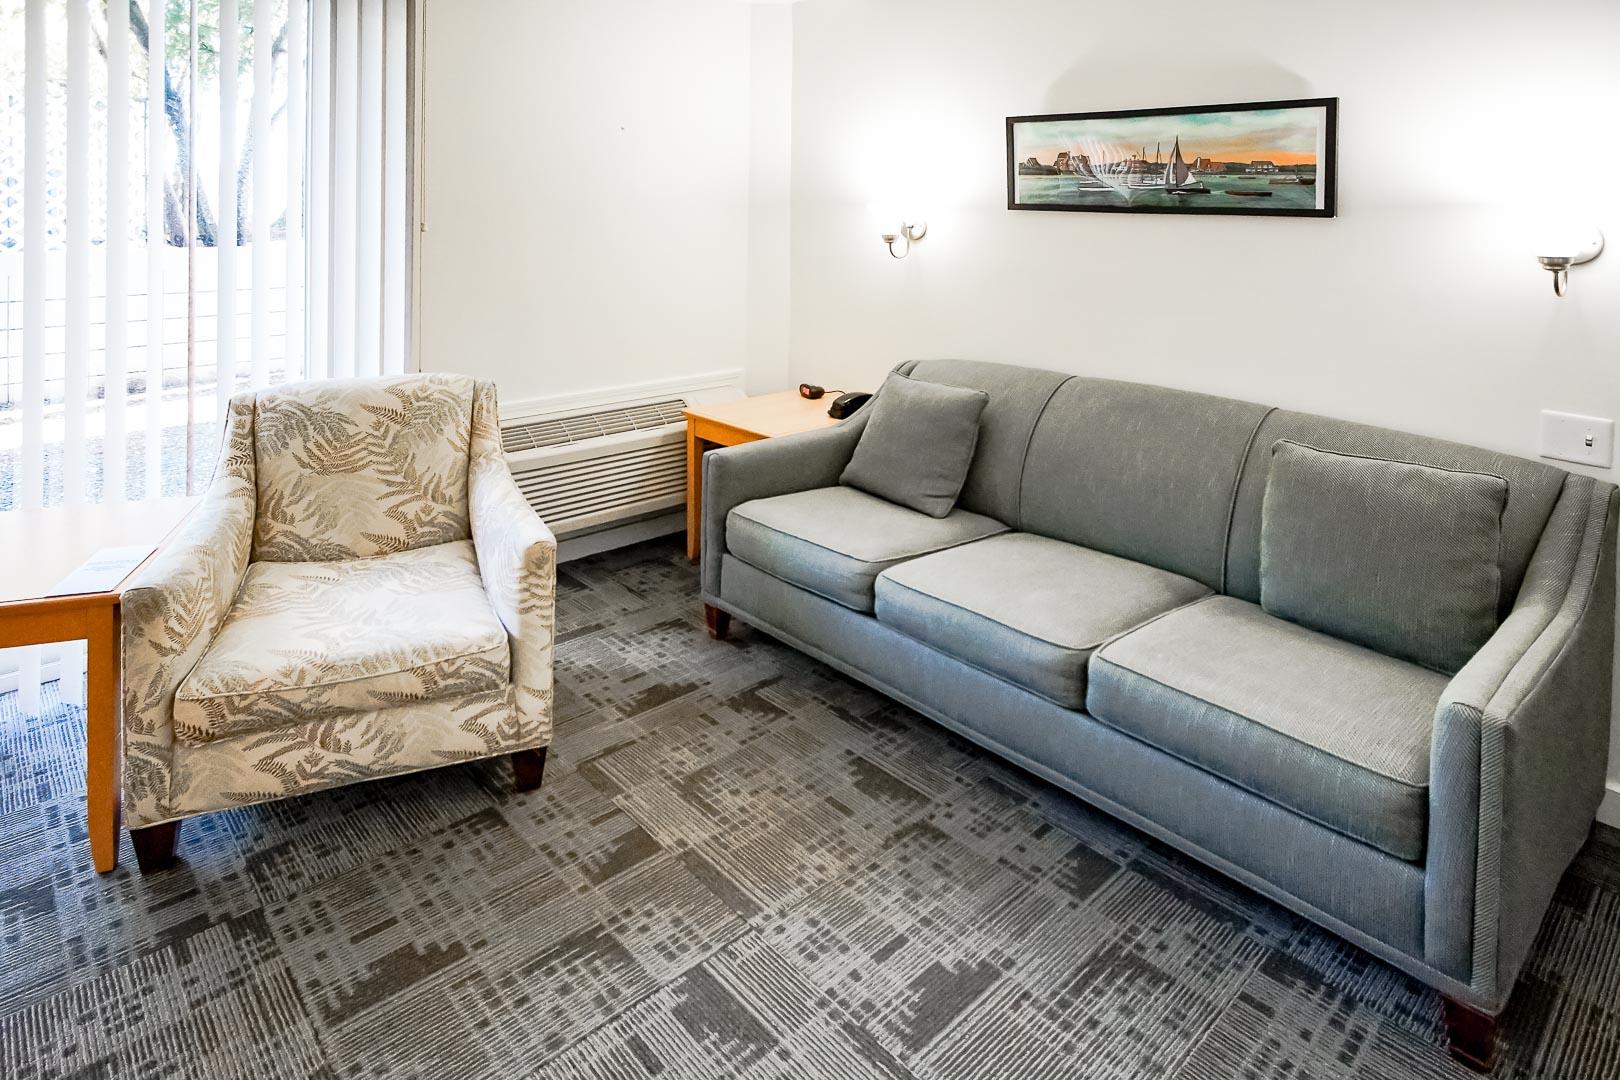 A standard living room at VRI's Courtyard Resort in Massachusetts.